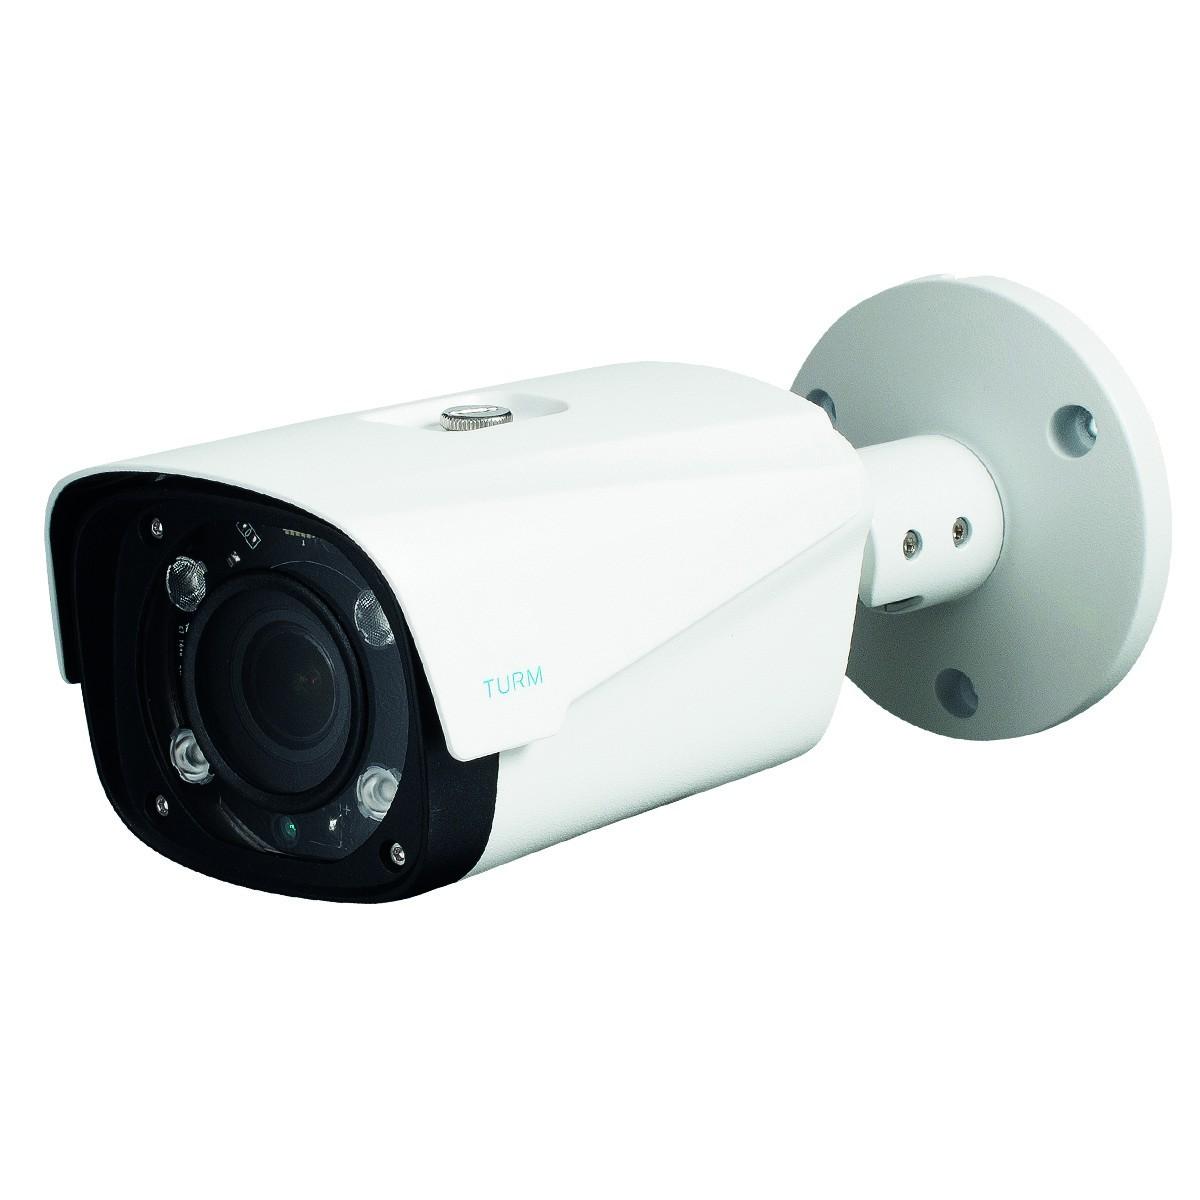 ip netzwerk kamera 4 megapixel 60m ip43 - Secura Baucam